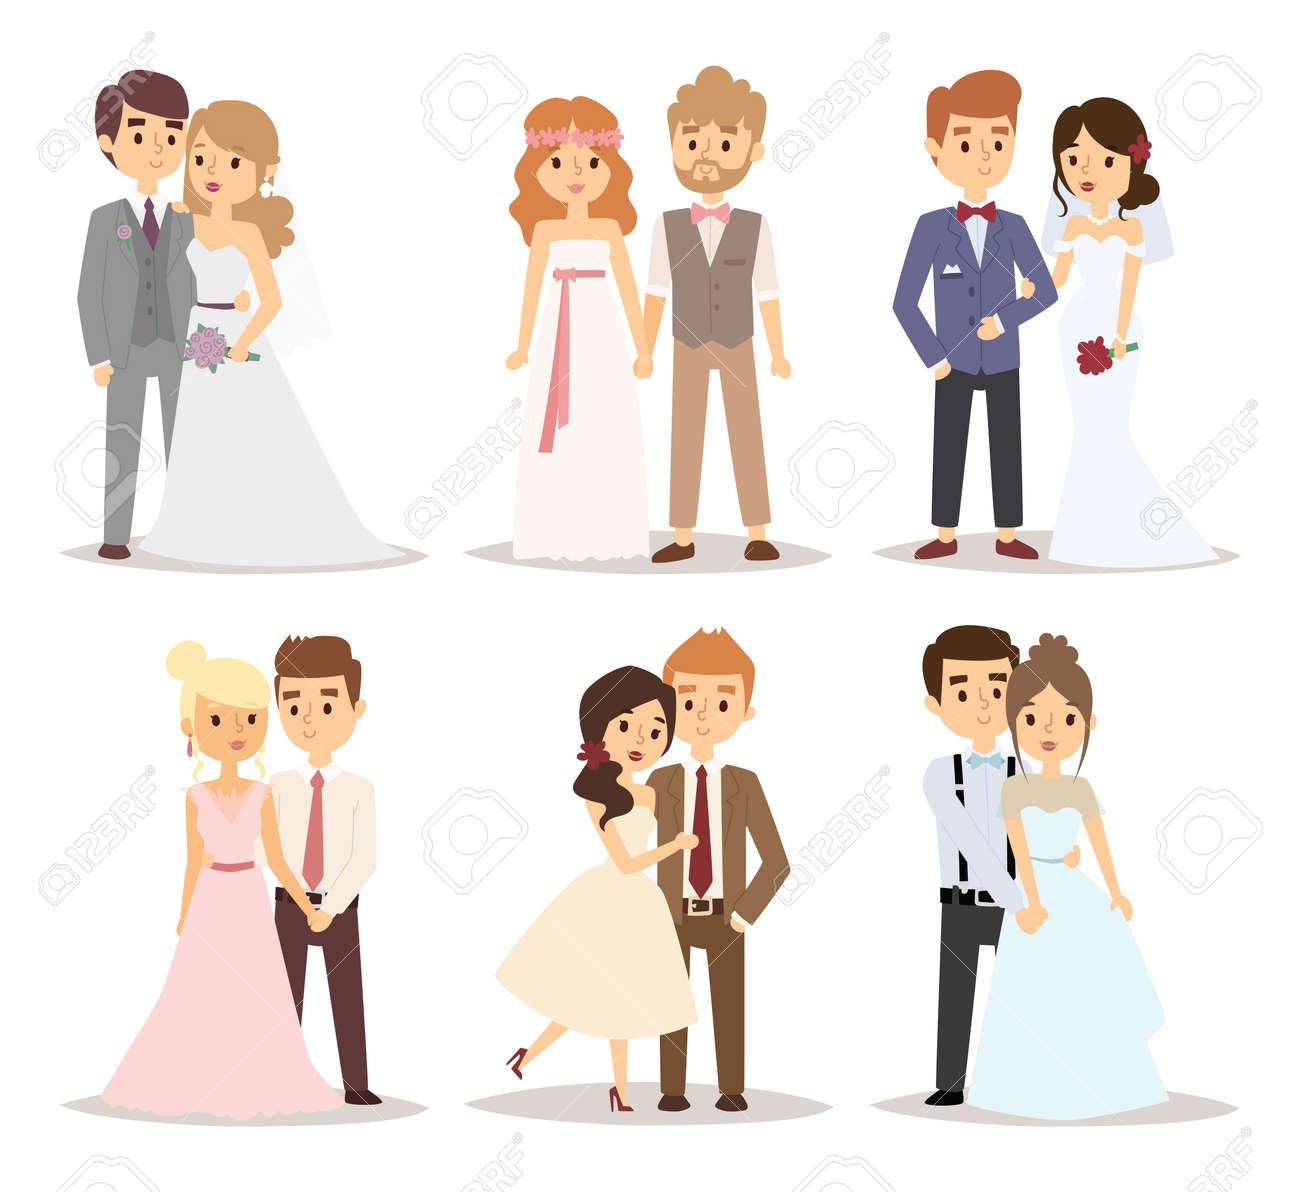 Wedding couple vector illustration. - 53184417